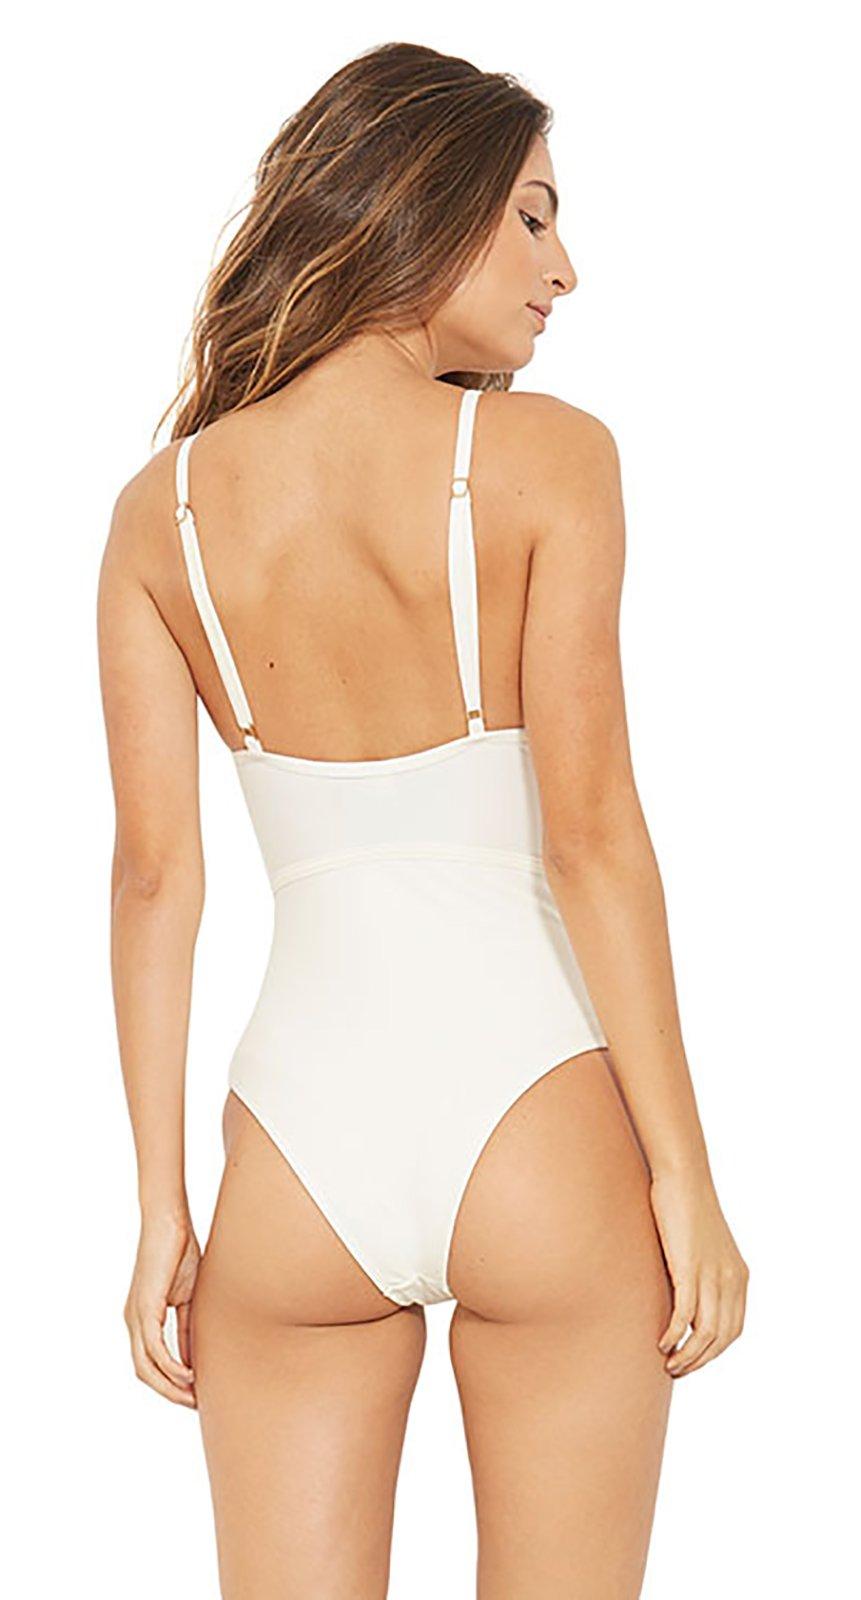 74d1bc74c6d ... Ecru one-piece swimsuit with a strappy neckline - GOLF BRANCO PEROLA ...